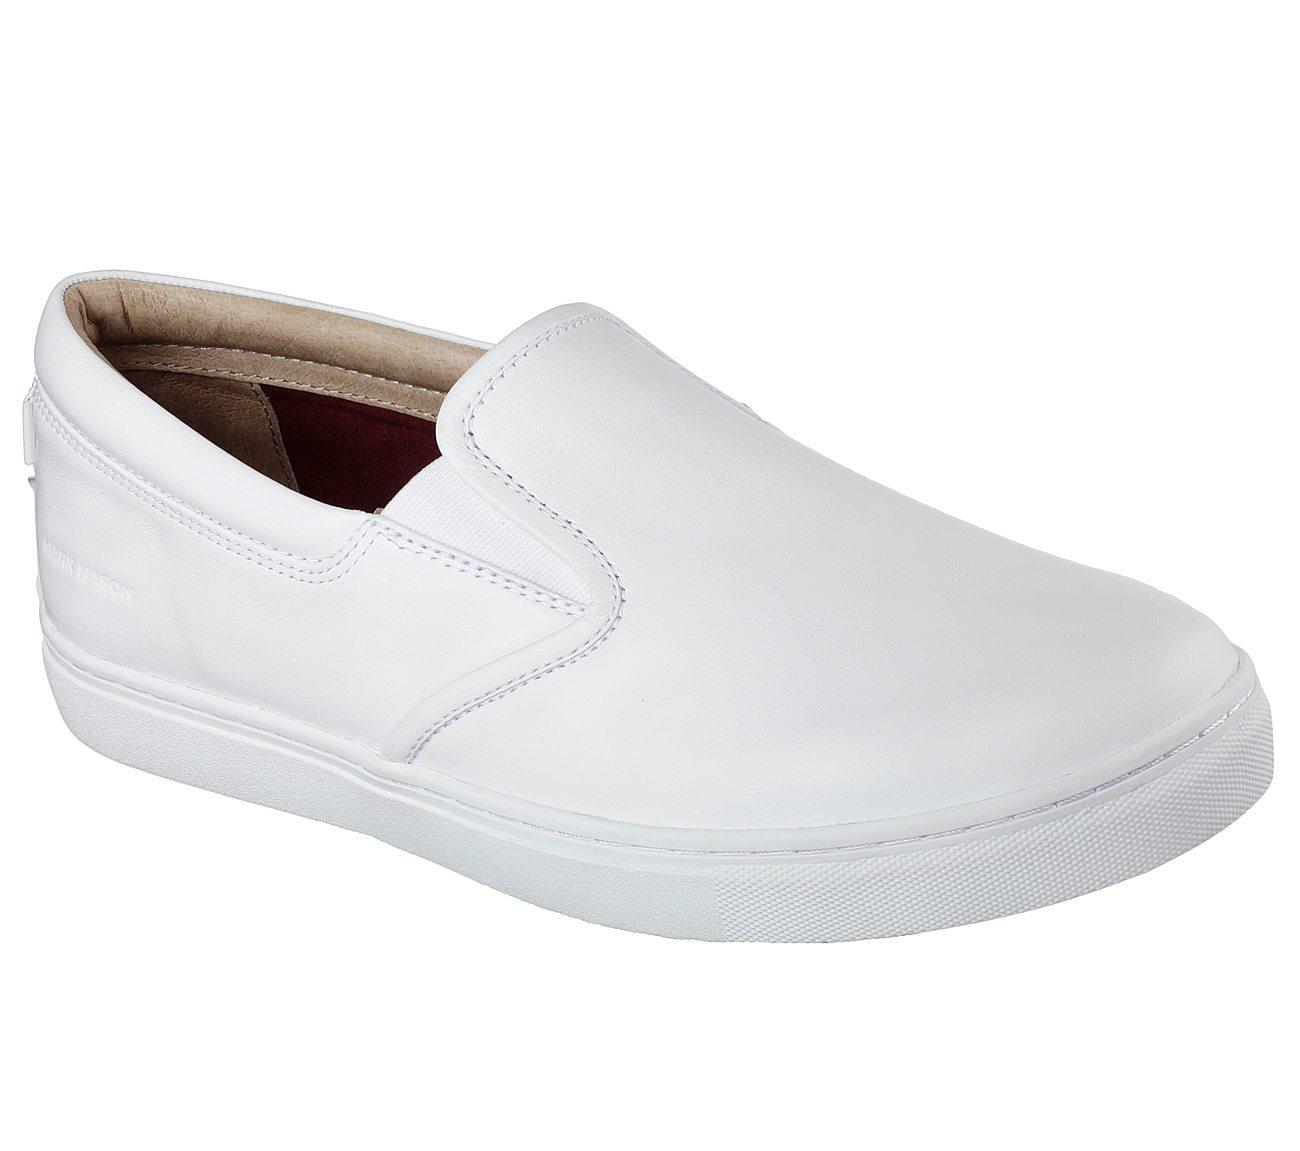 Buy SKECHERS Gower Mark Nason Shoes